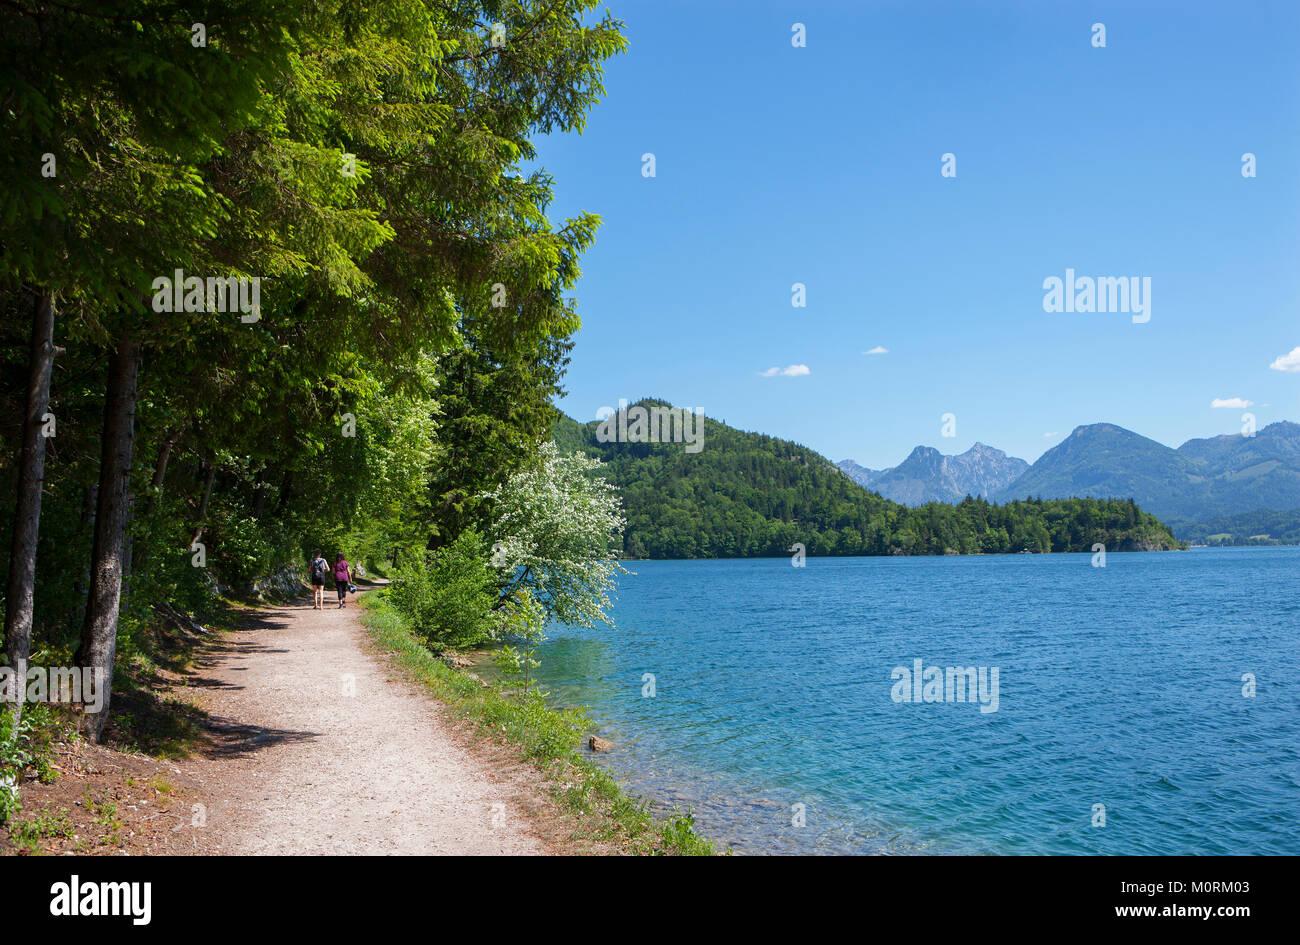 Austria, Salzkammergut, Salzburg State, Sankt Gilgen, Wolfgangsee, hikers on waterfront promenade - Stock Image